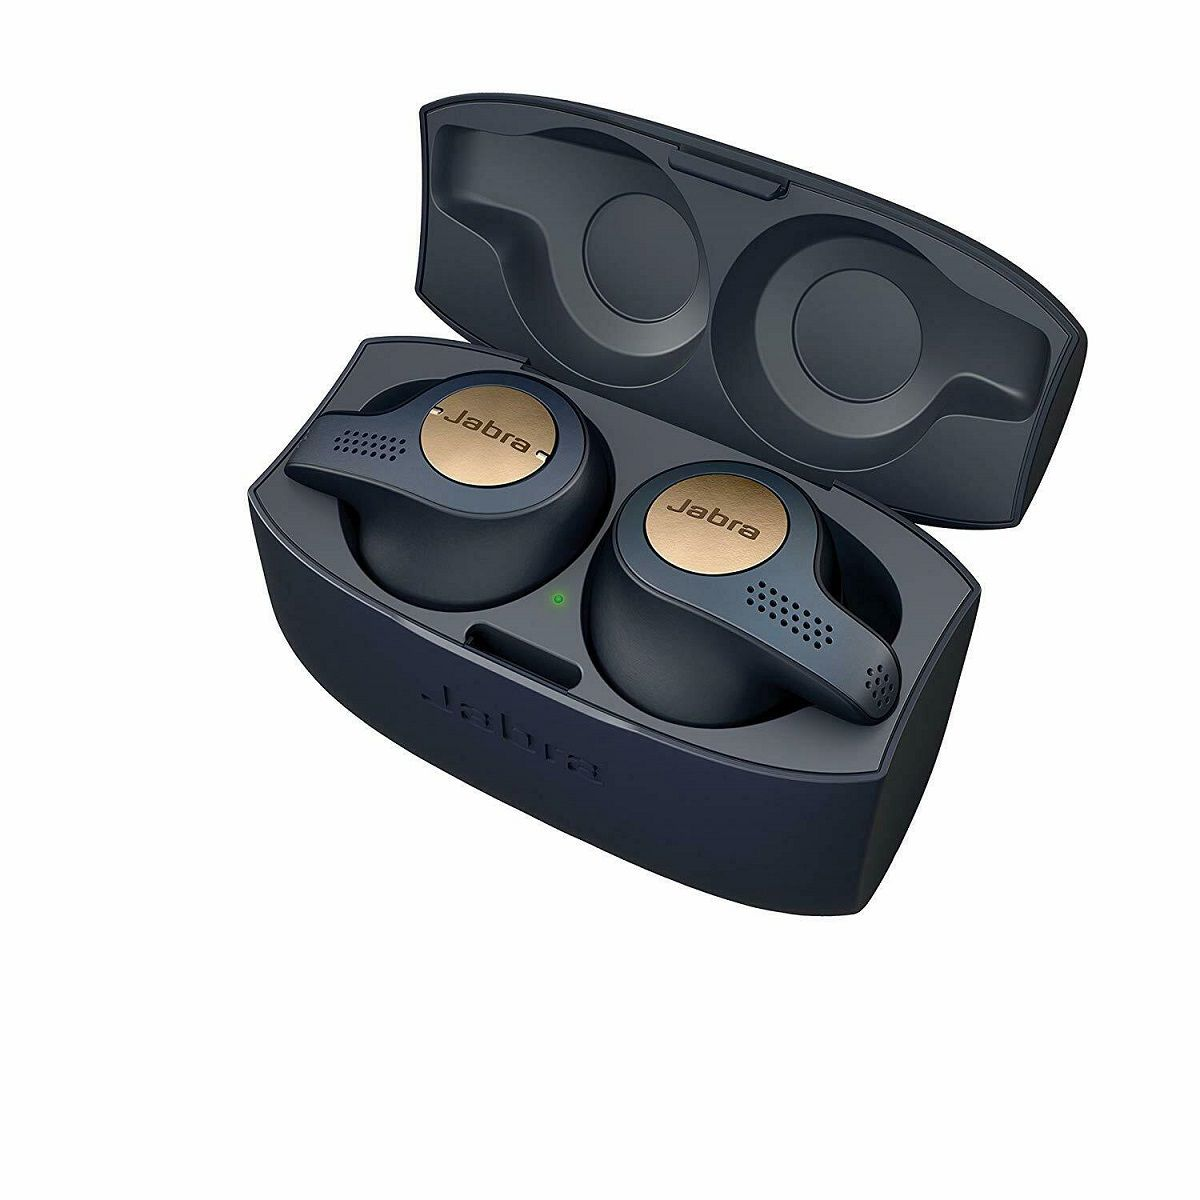 Fone de Ouvido Bluetooth Jabra Elite Active 65t Earbuds 100-99010002-NCR